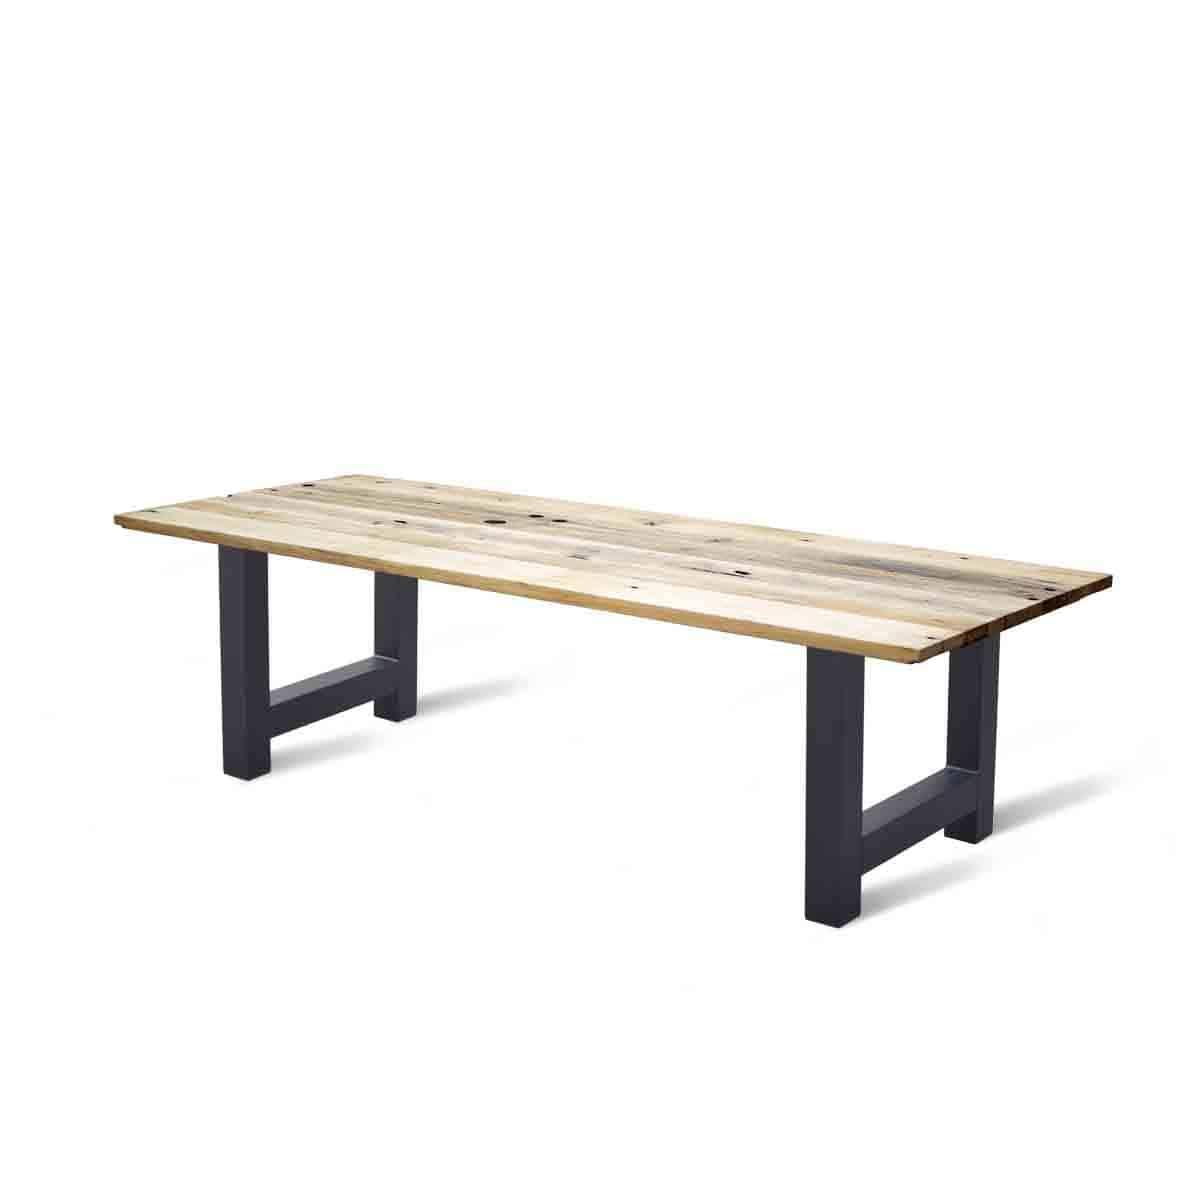 Massief eiken houten wagonhout eetkamer tafel eettafel keuken meubelmaker friesland